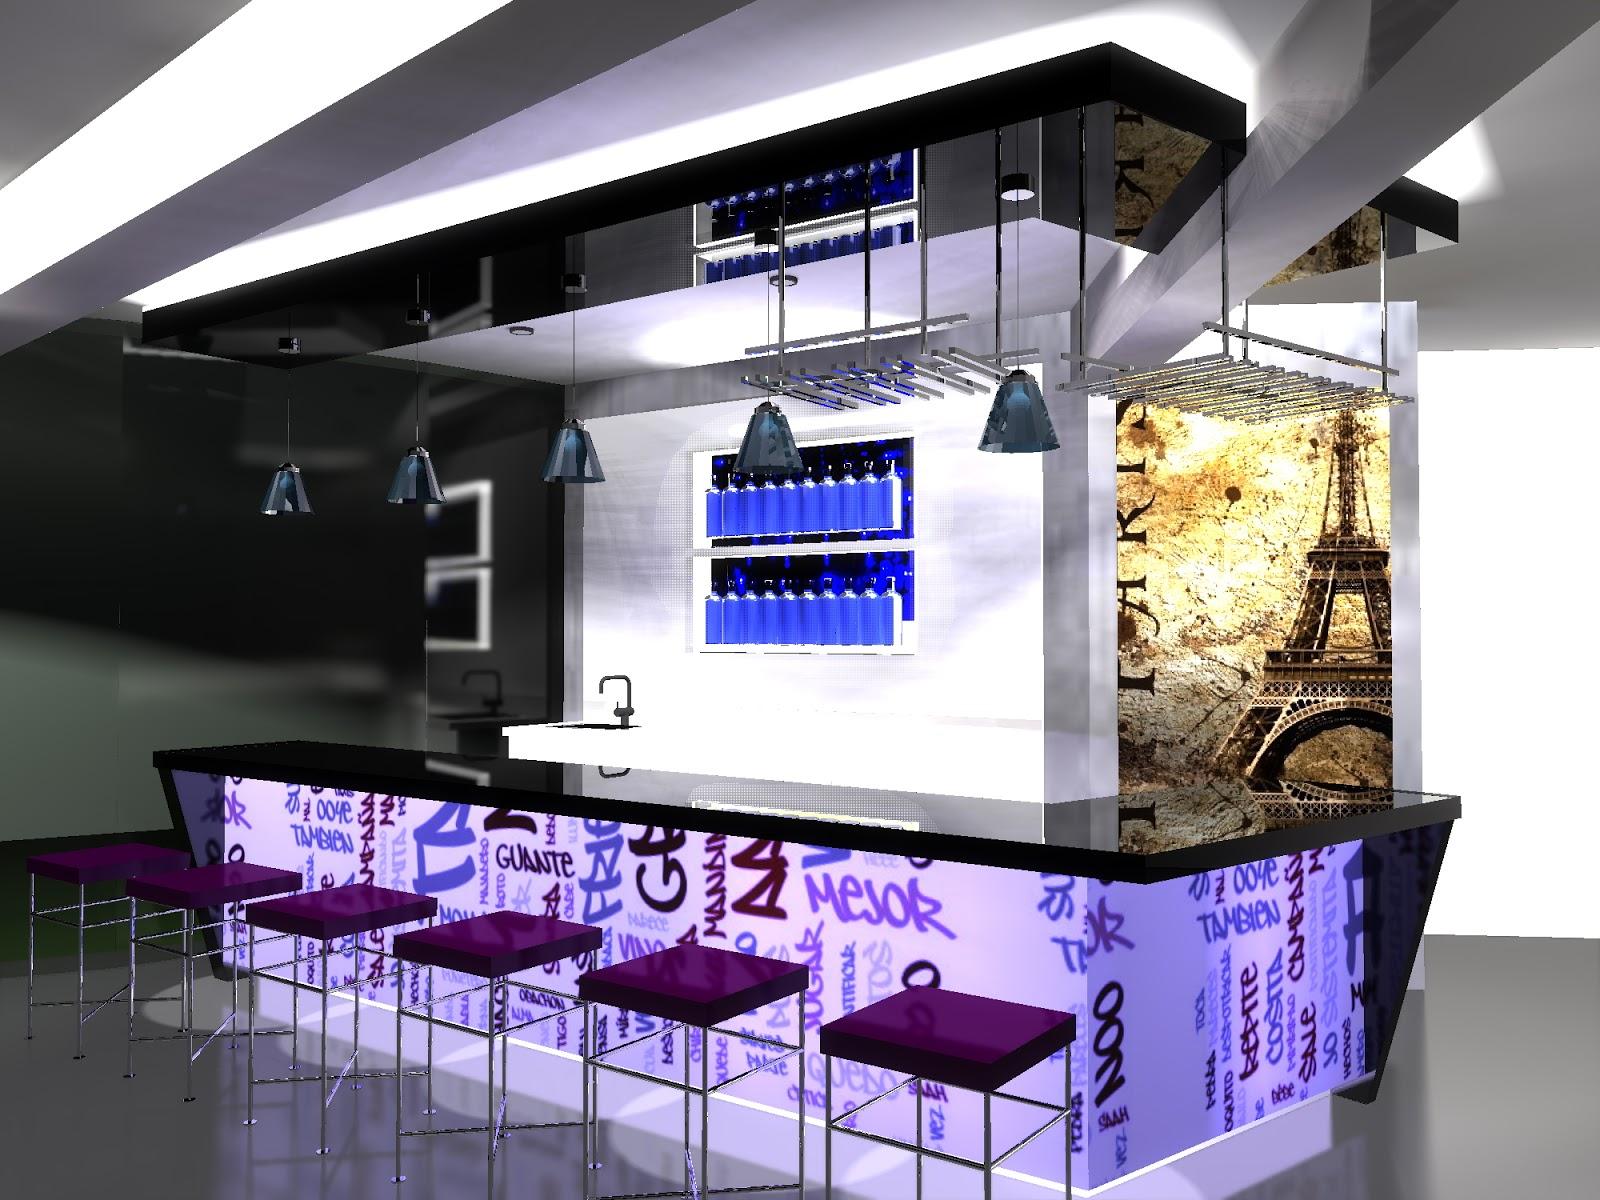 Muebles dise os y proyectos - Disenos de barras de bar ...